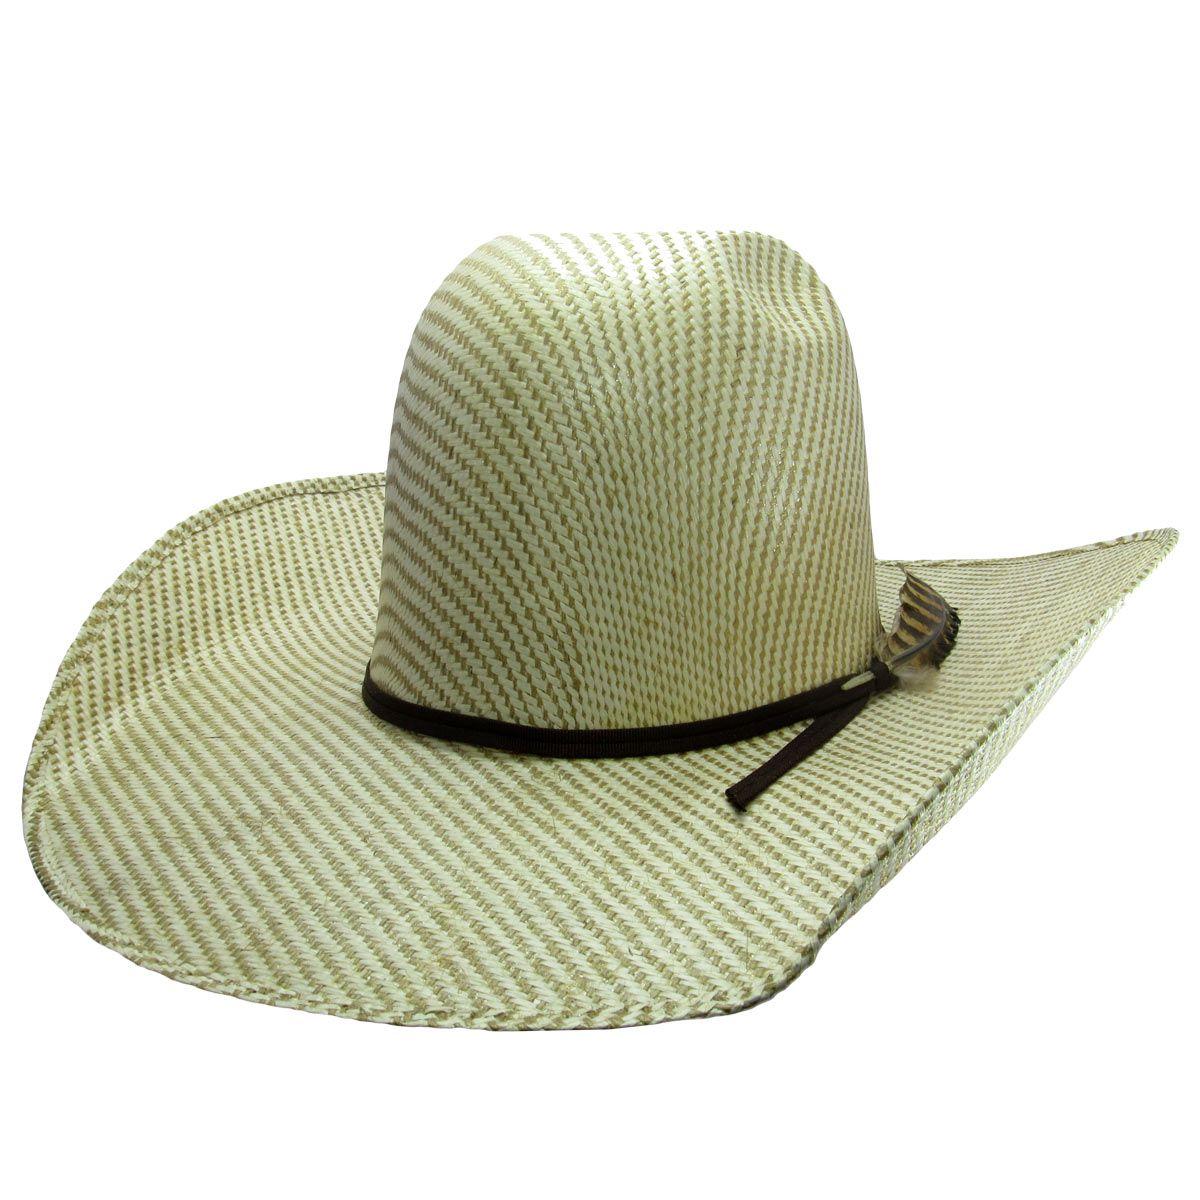 Chapéu Country Rodeio Texas Indian Valtierra Modelo N°1